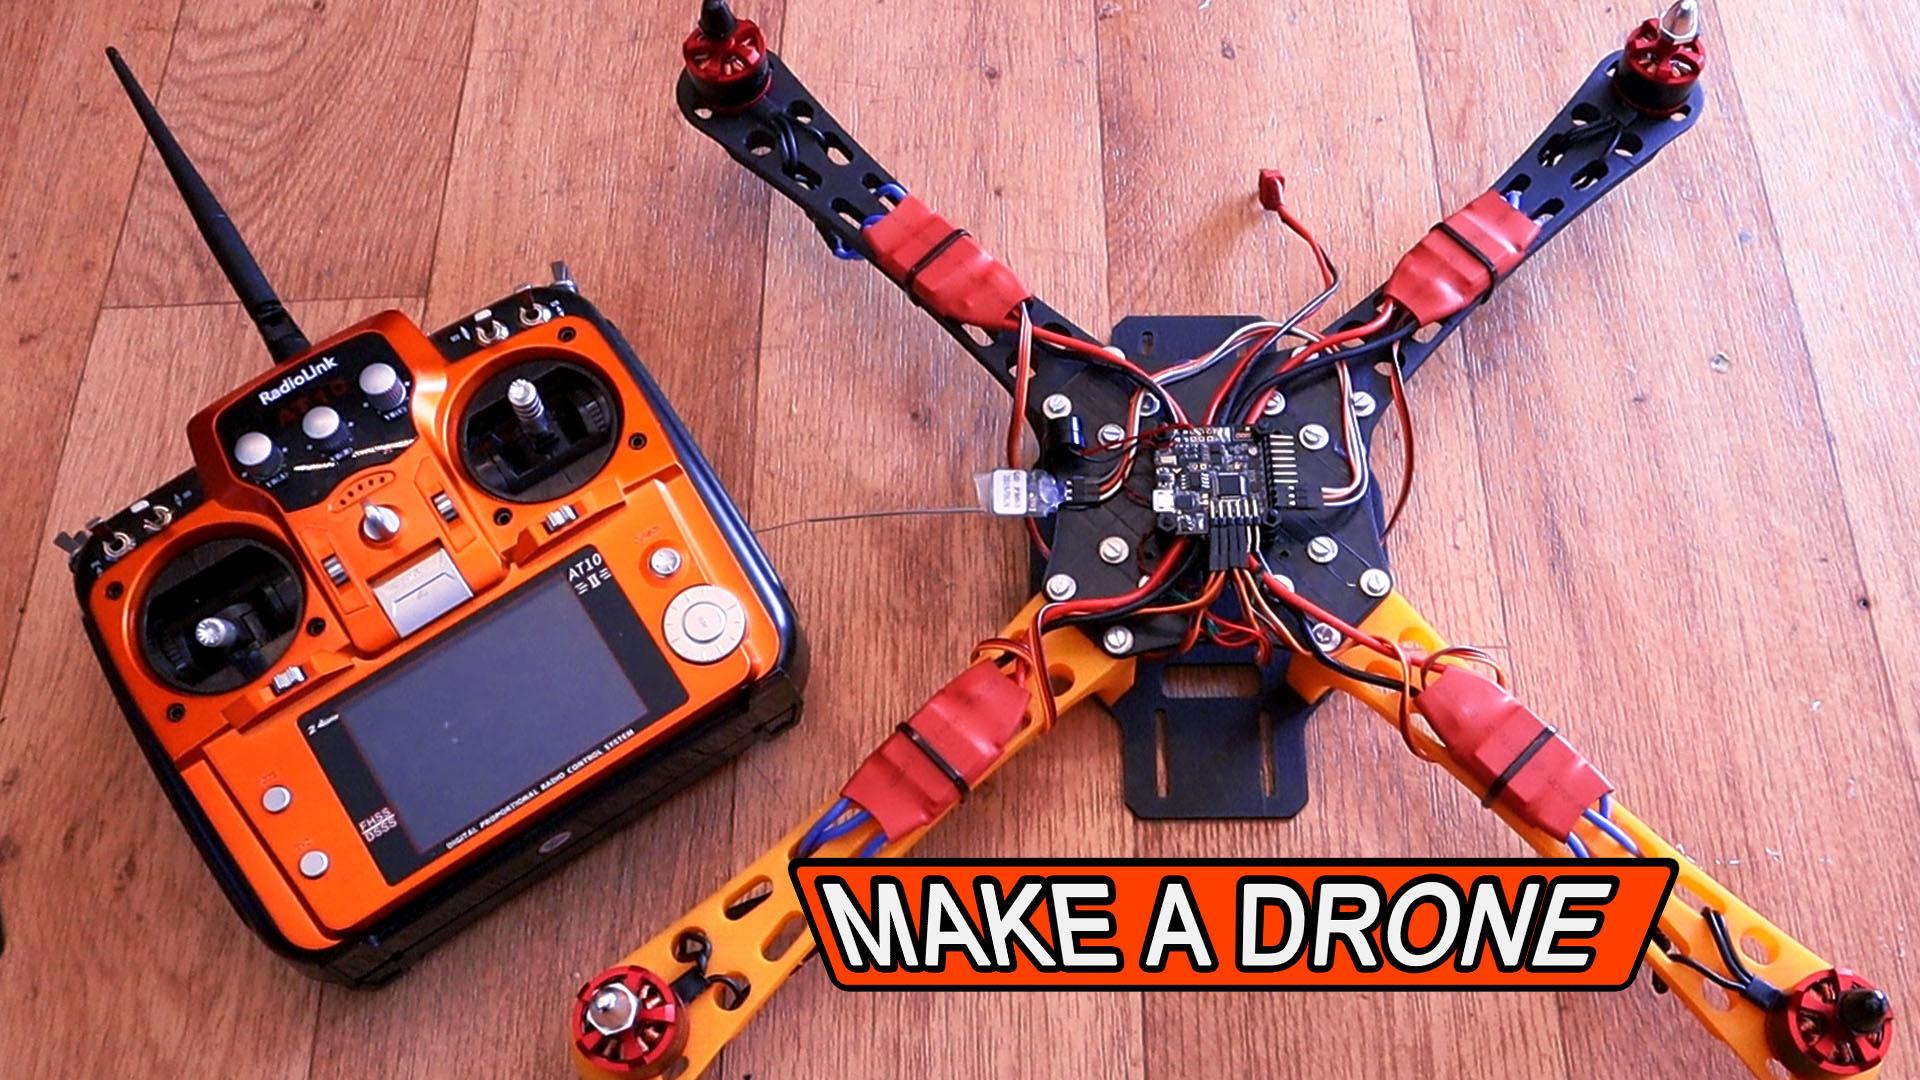 Robotics tutorials arduino robot drones RC planes